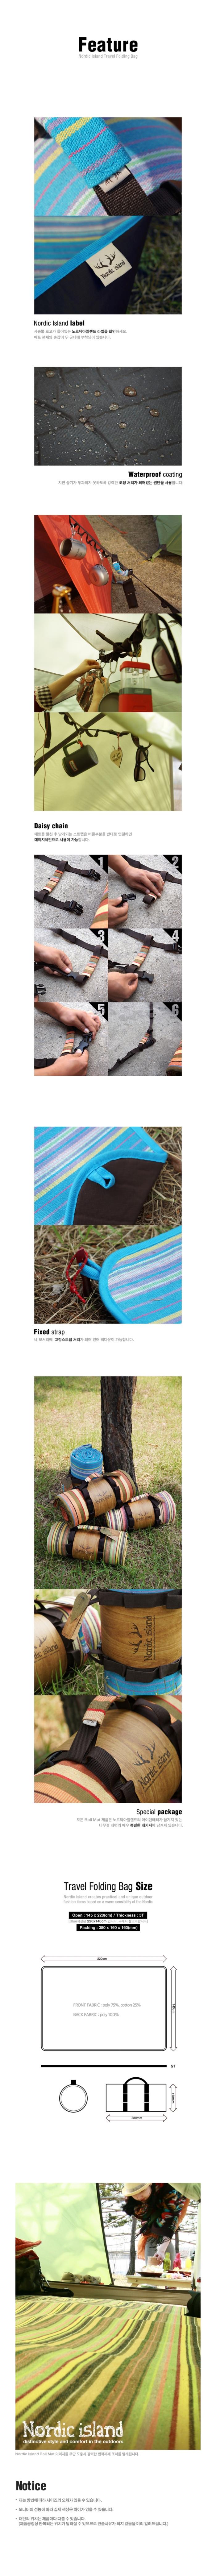 (複製)NORDIC ISLAND | Roll mat防水野餐墊 (Stripe Blue)